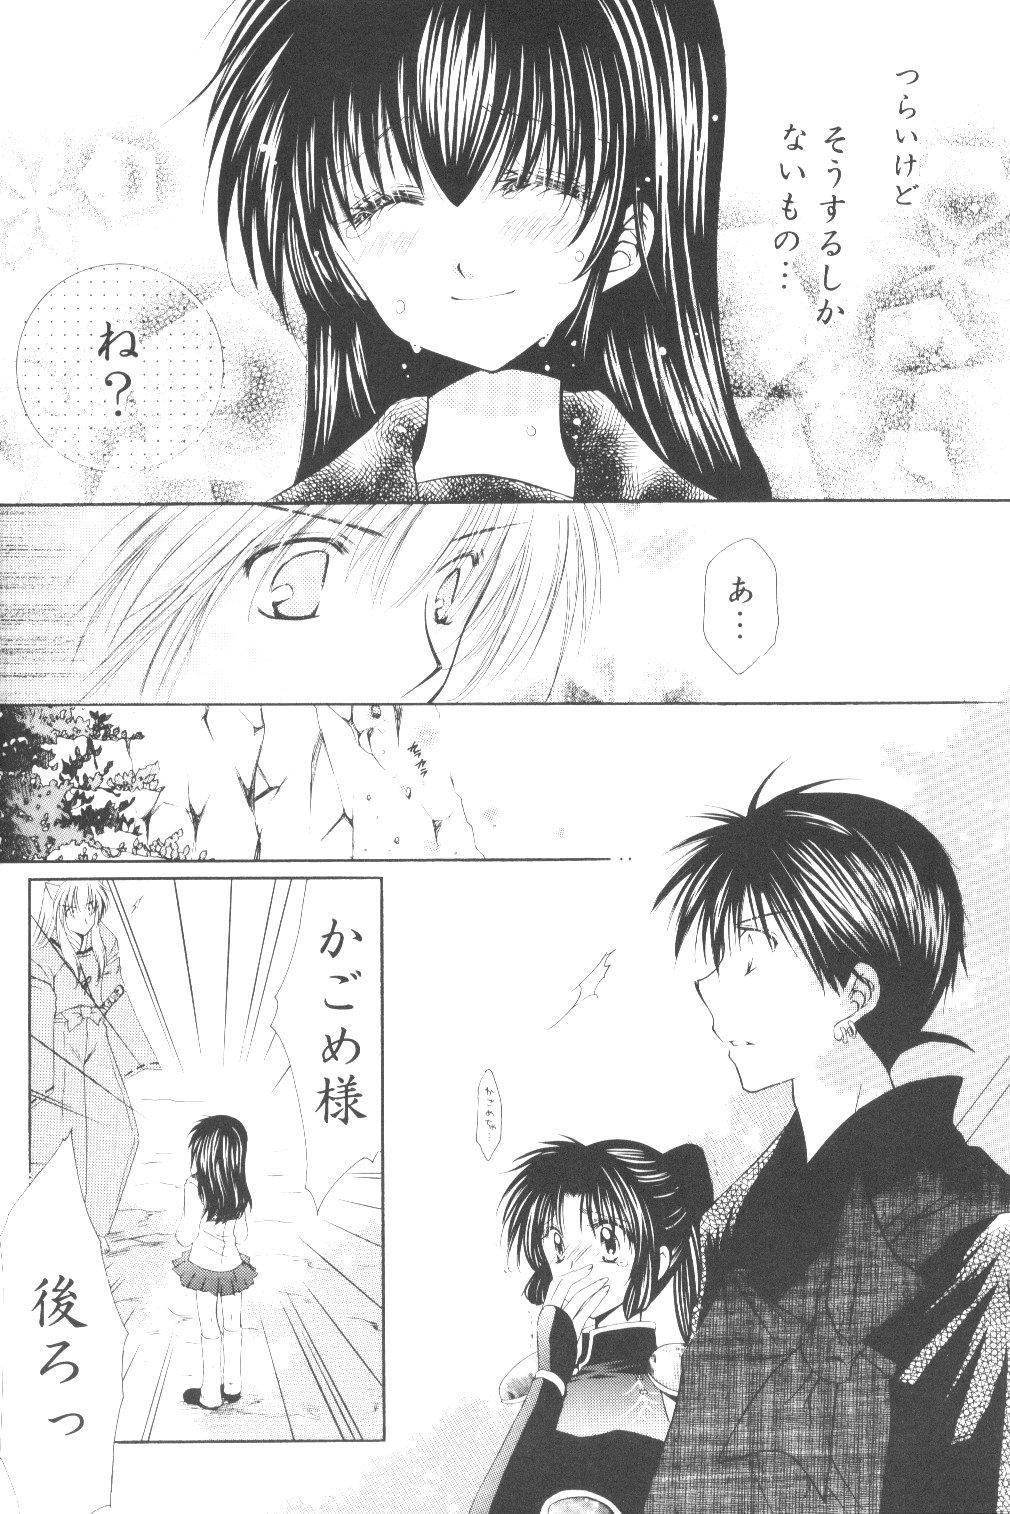 Ryuusei Ryodan 29